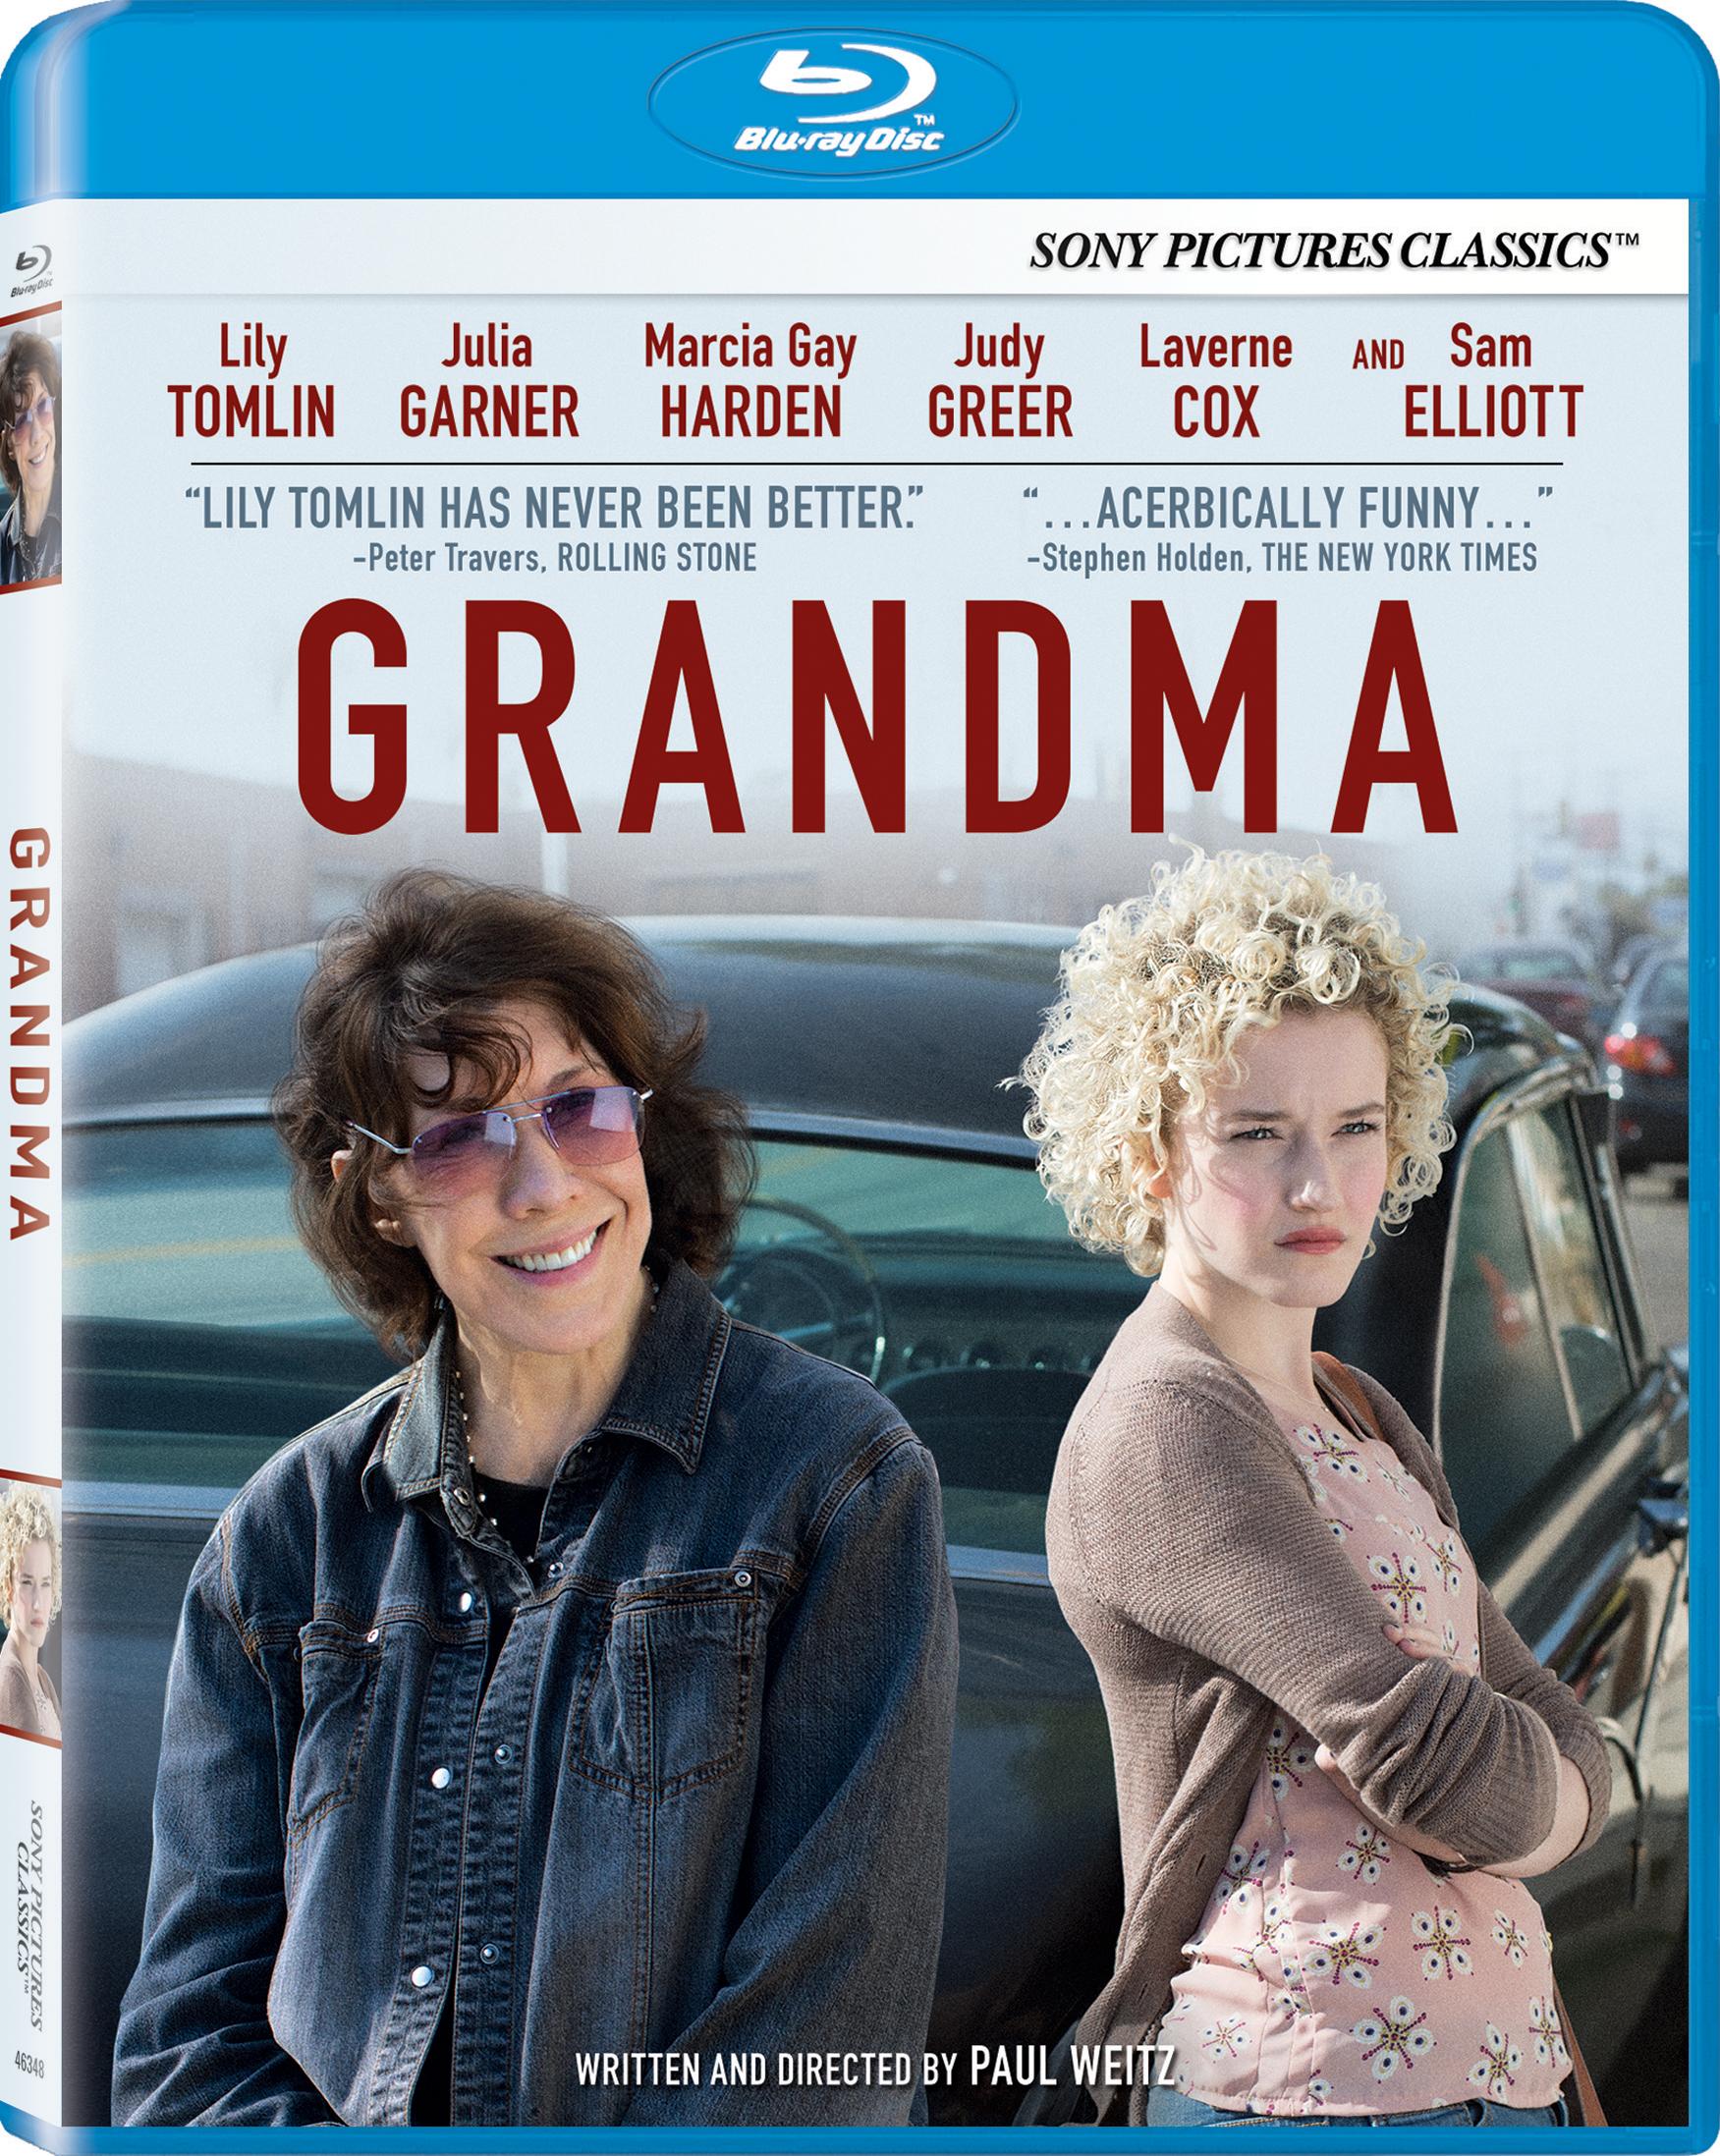 Grandma (2015) Blu-ray